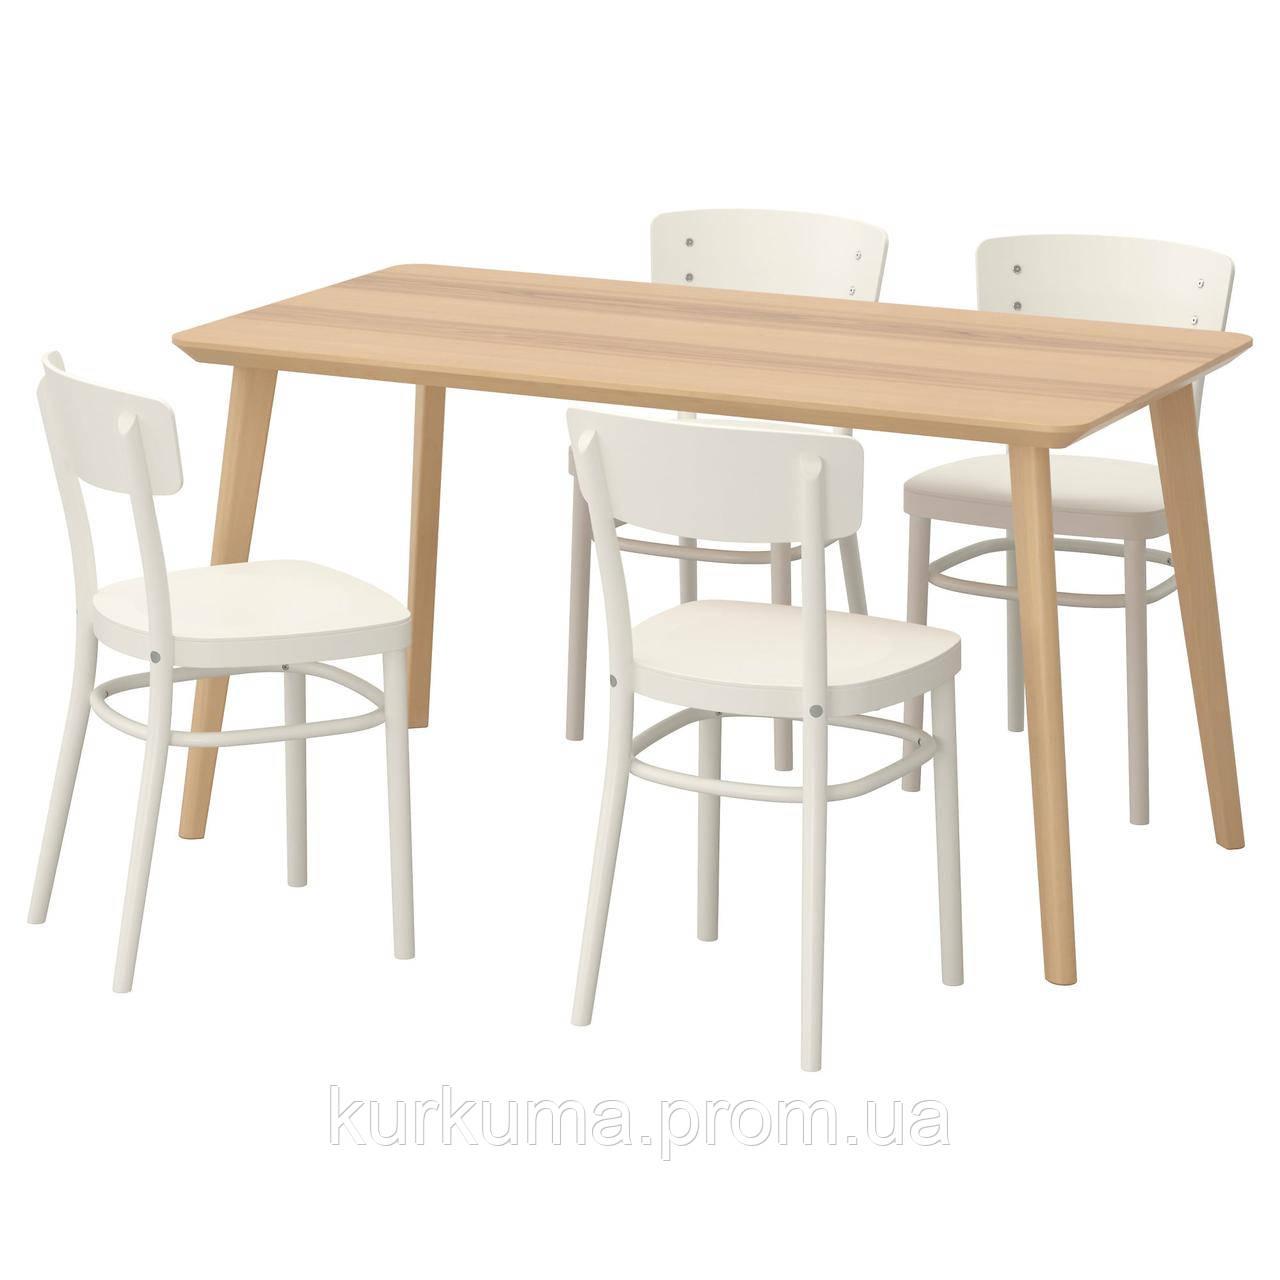 IKEA LISABO/IDOLF Стол и 4 стула, ясень шпон, белый  (491.614.83)